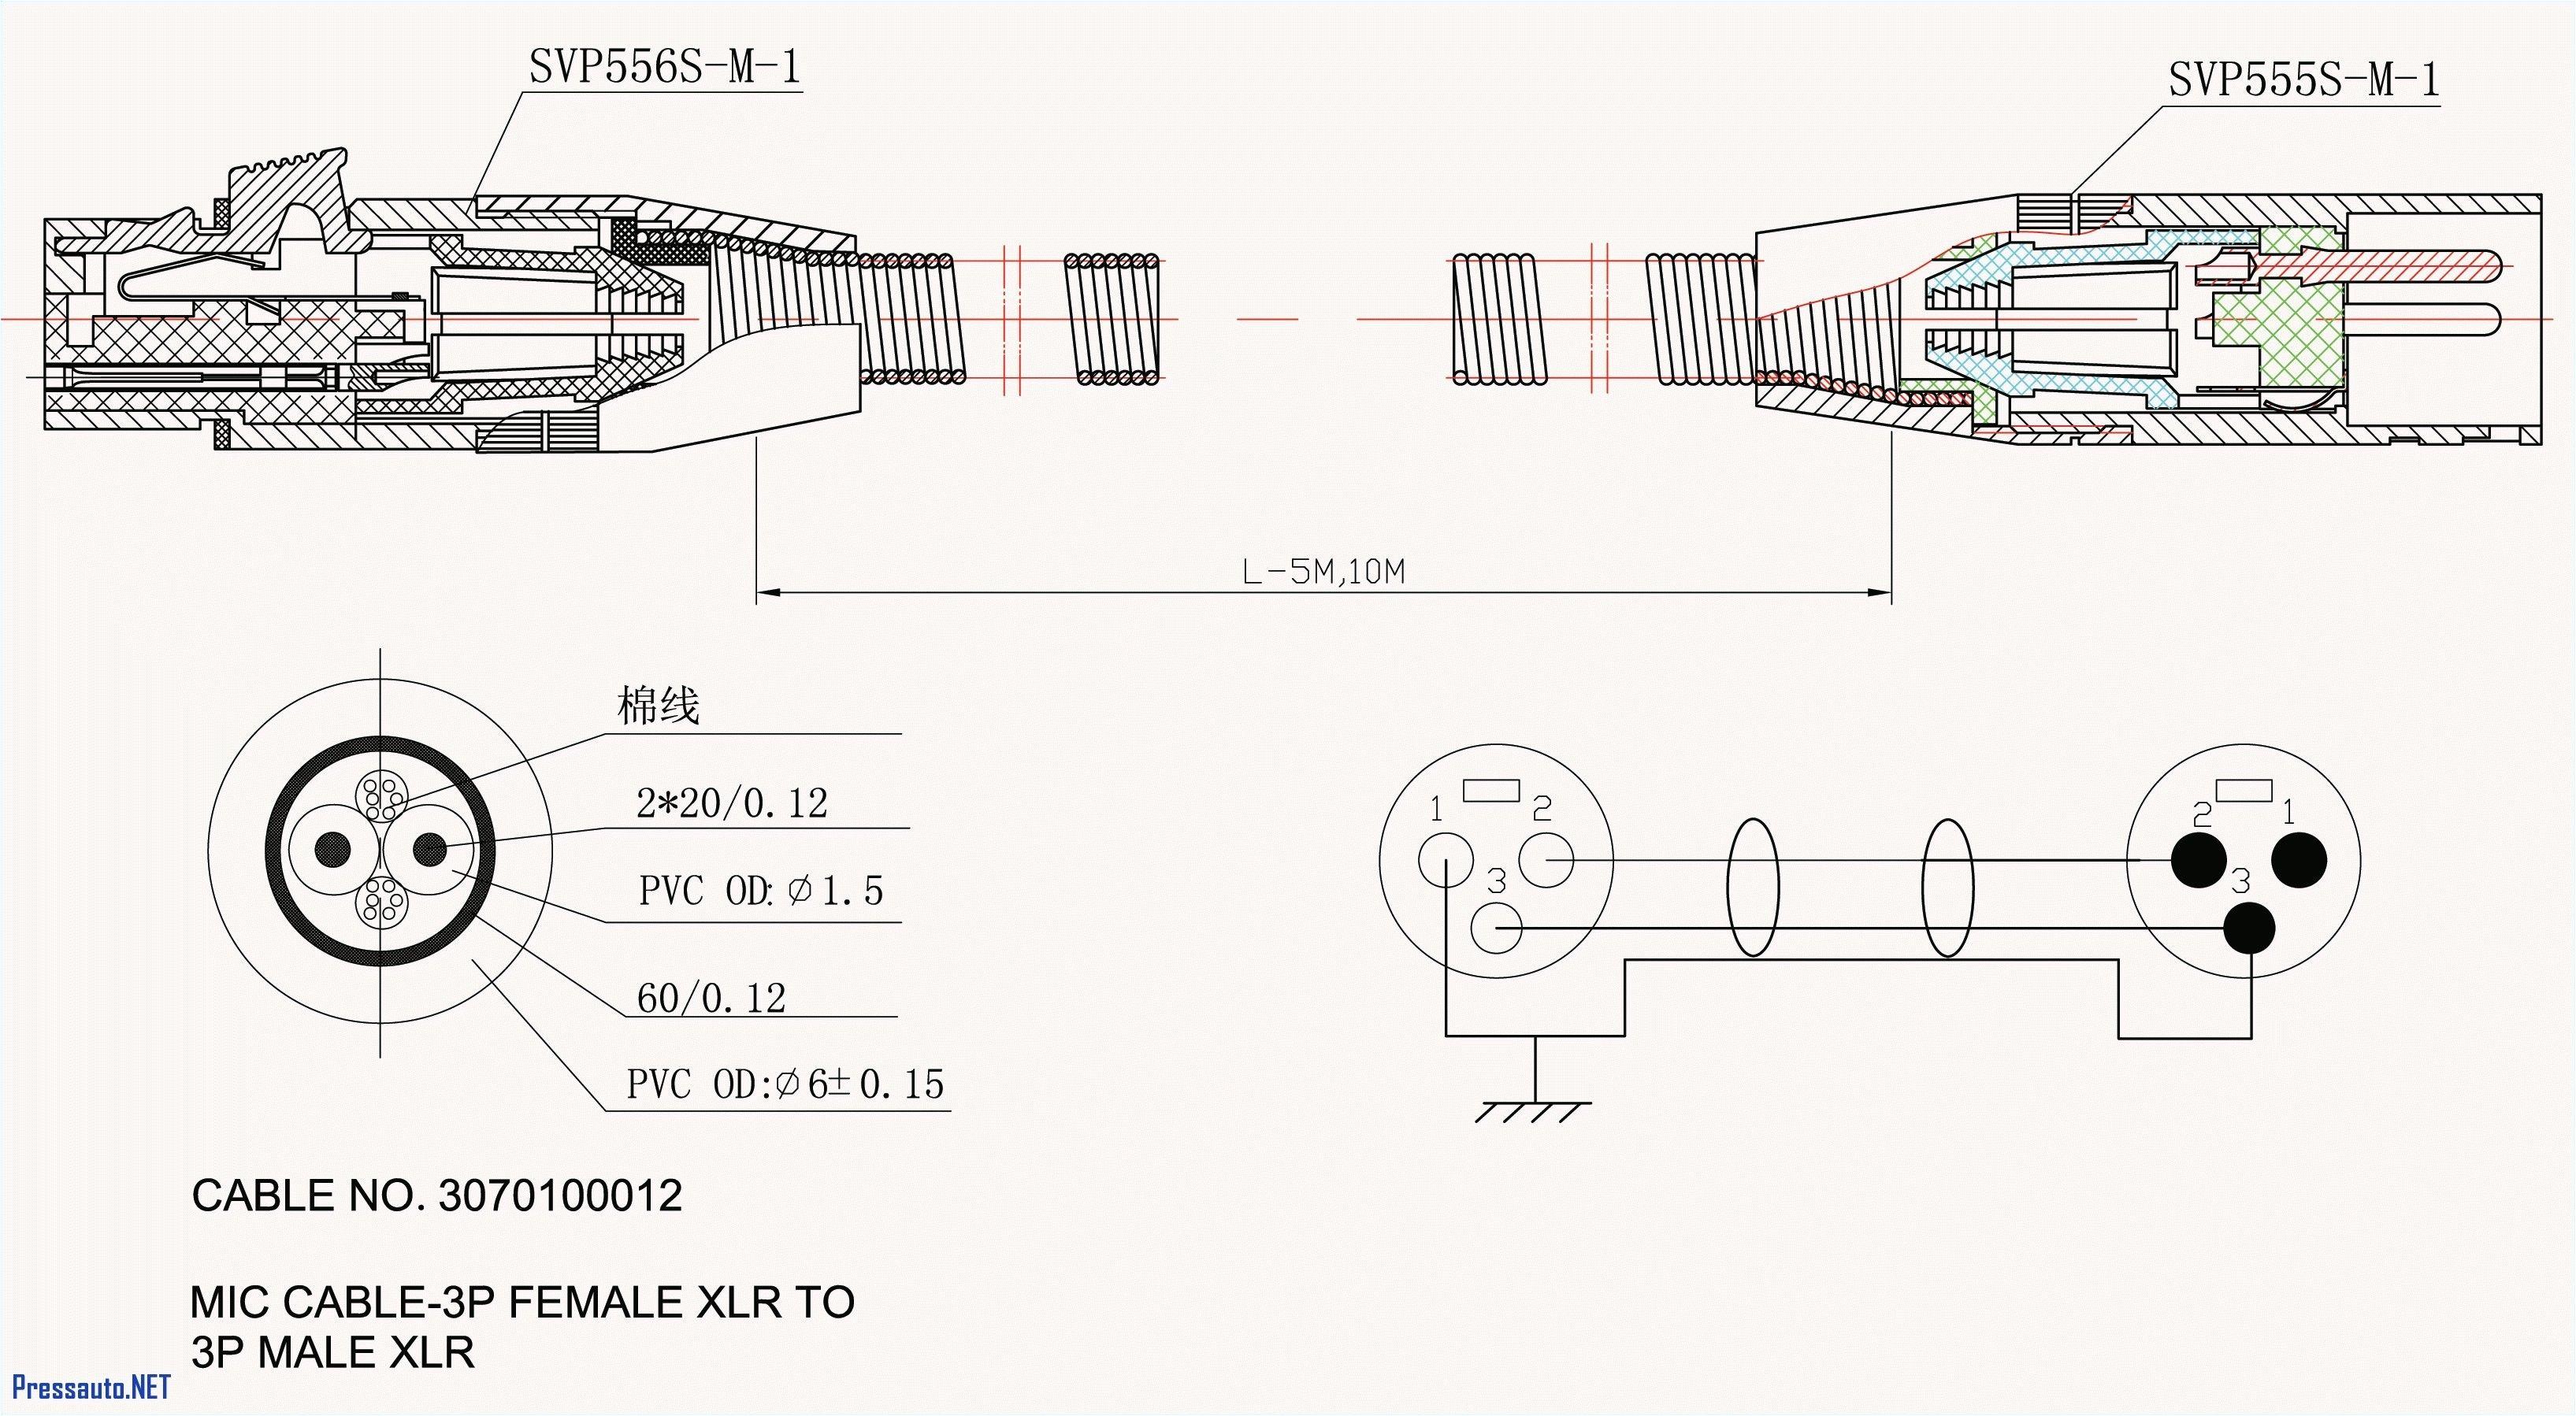 Xlr Connector Wiring Diagram Wiring Diagram Guitar Jack Save Xlr to Mono Jack Wiring Diagram In